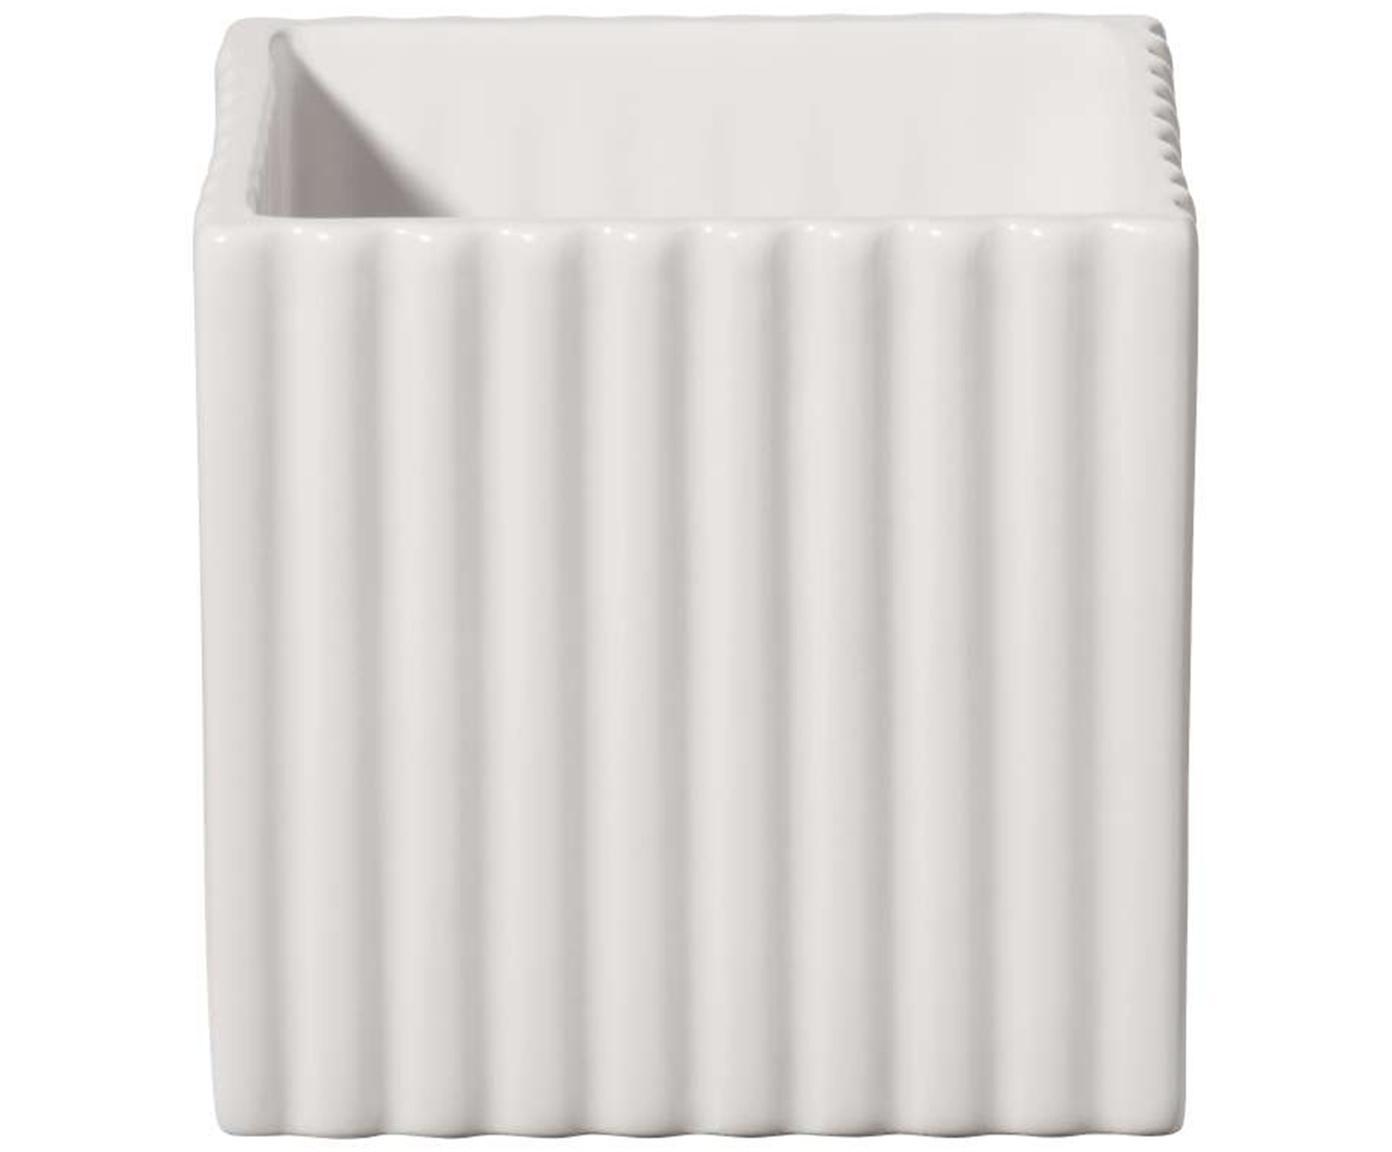 Übertopf Quadro, Keramik, Weiß, 10 x 10 cm